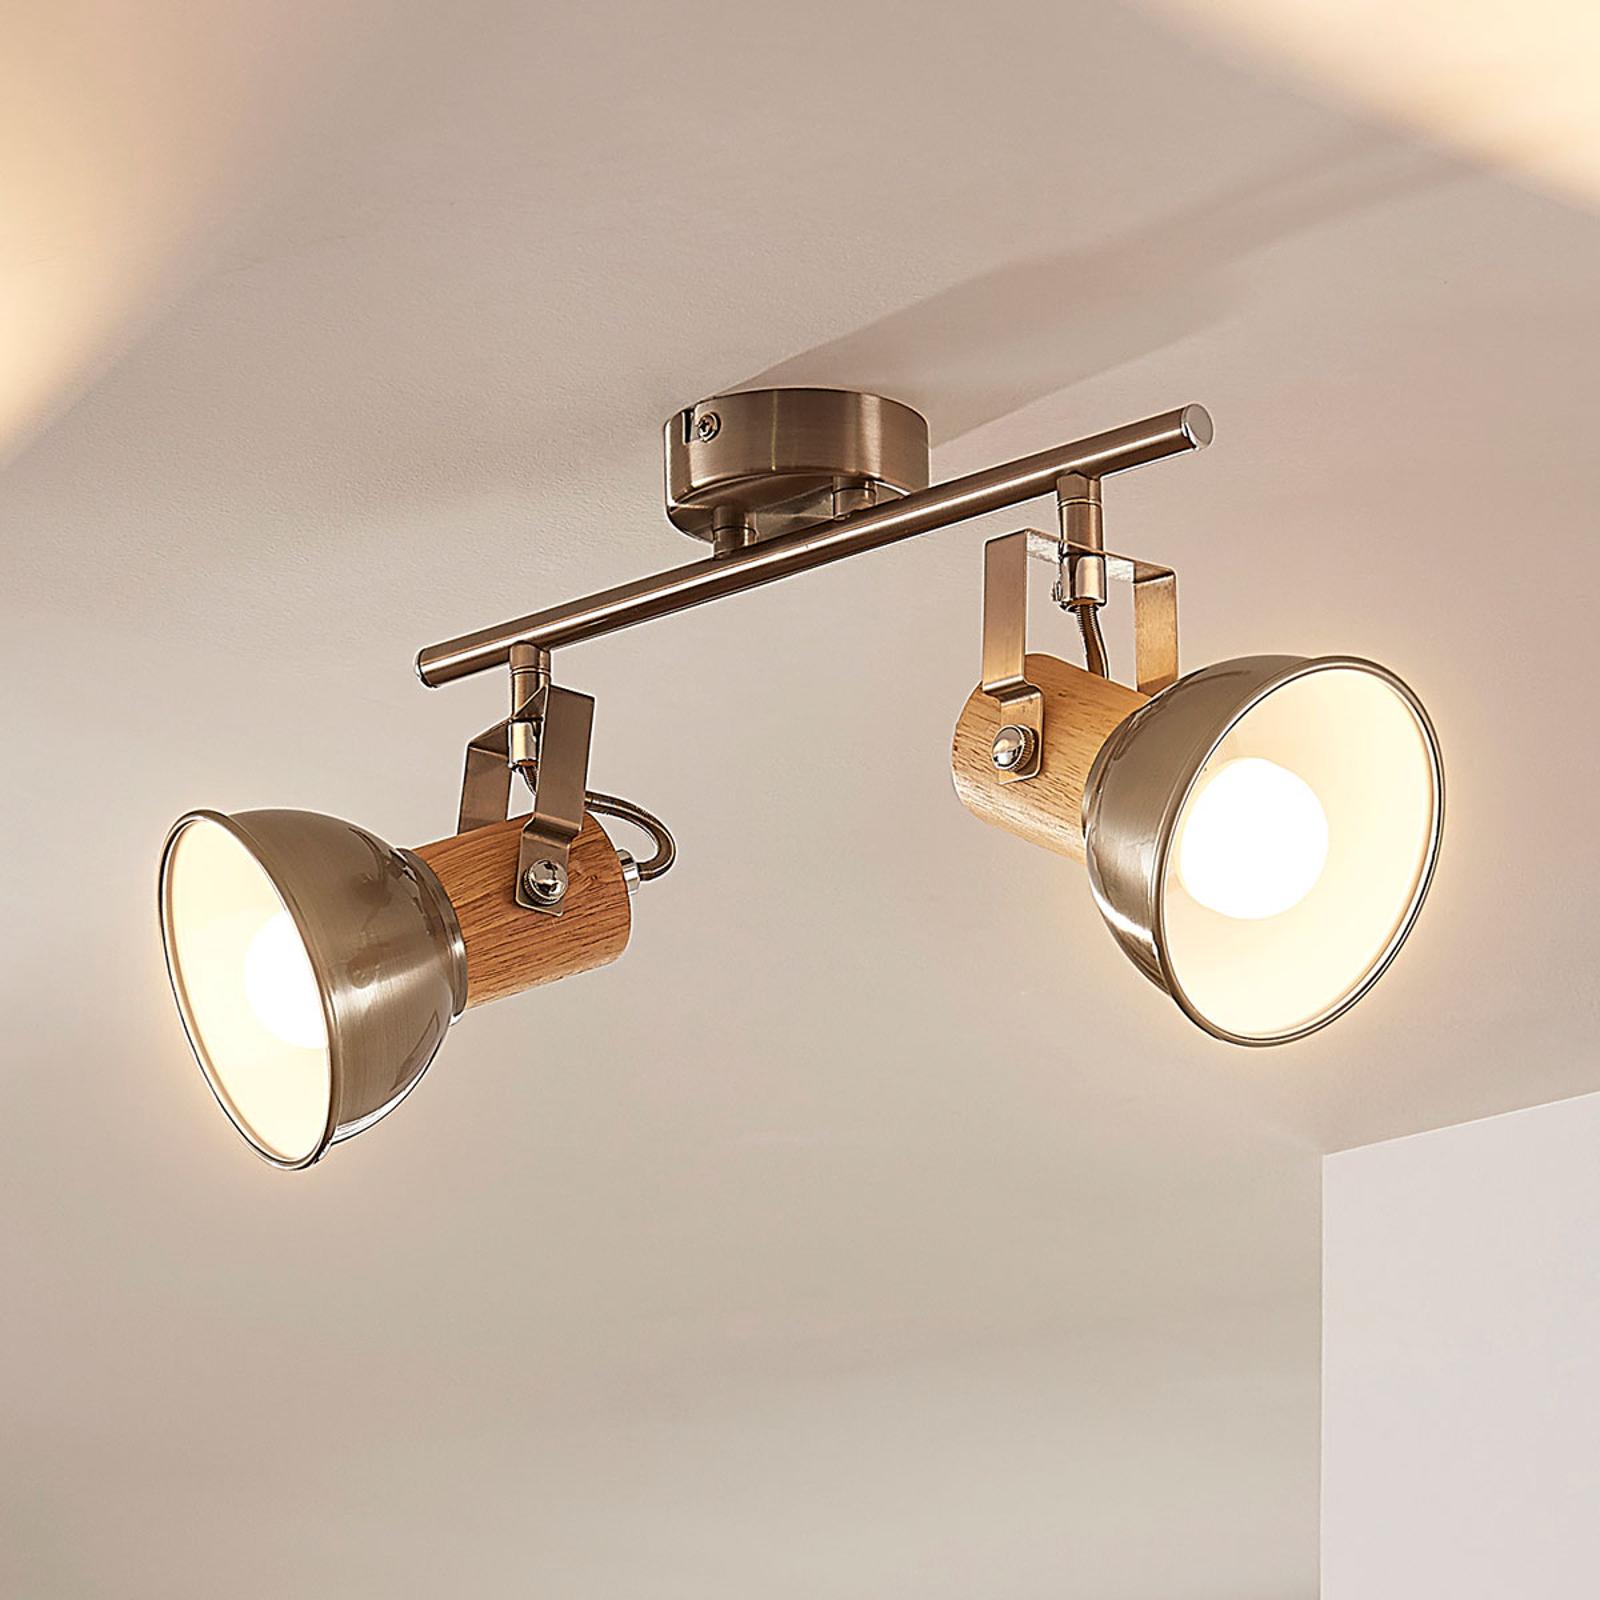 Houten LED plafondlamp Dennis, 2 lampen